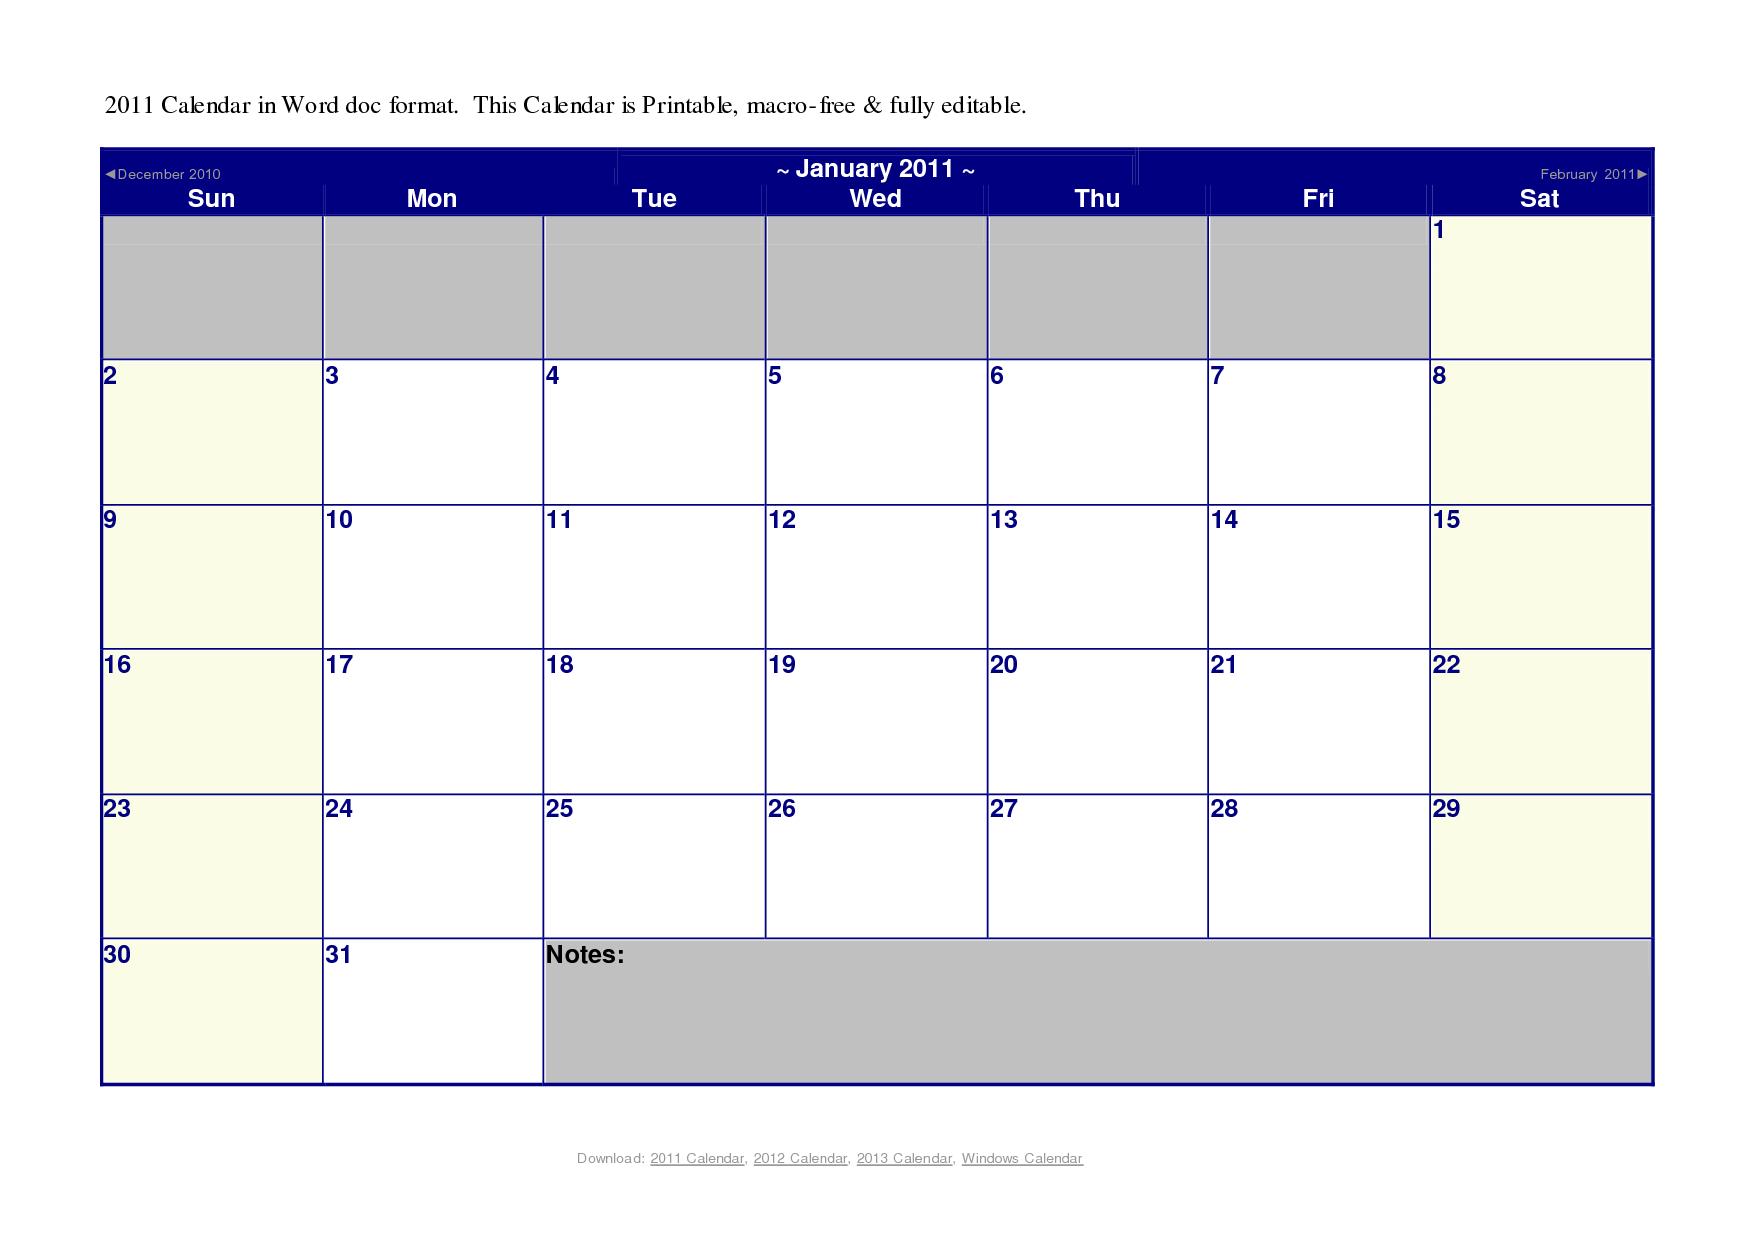 20 Microsoft Blank Calendar Template Images - Microsoft Word